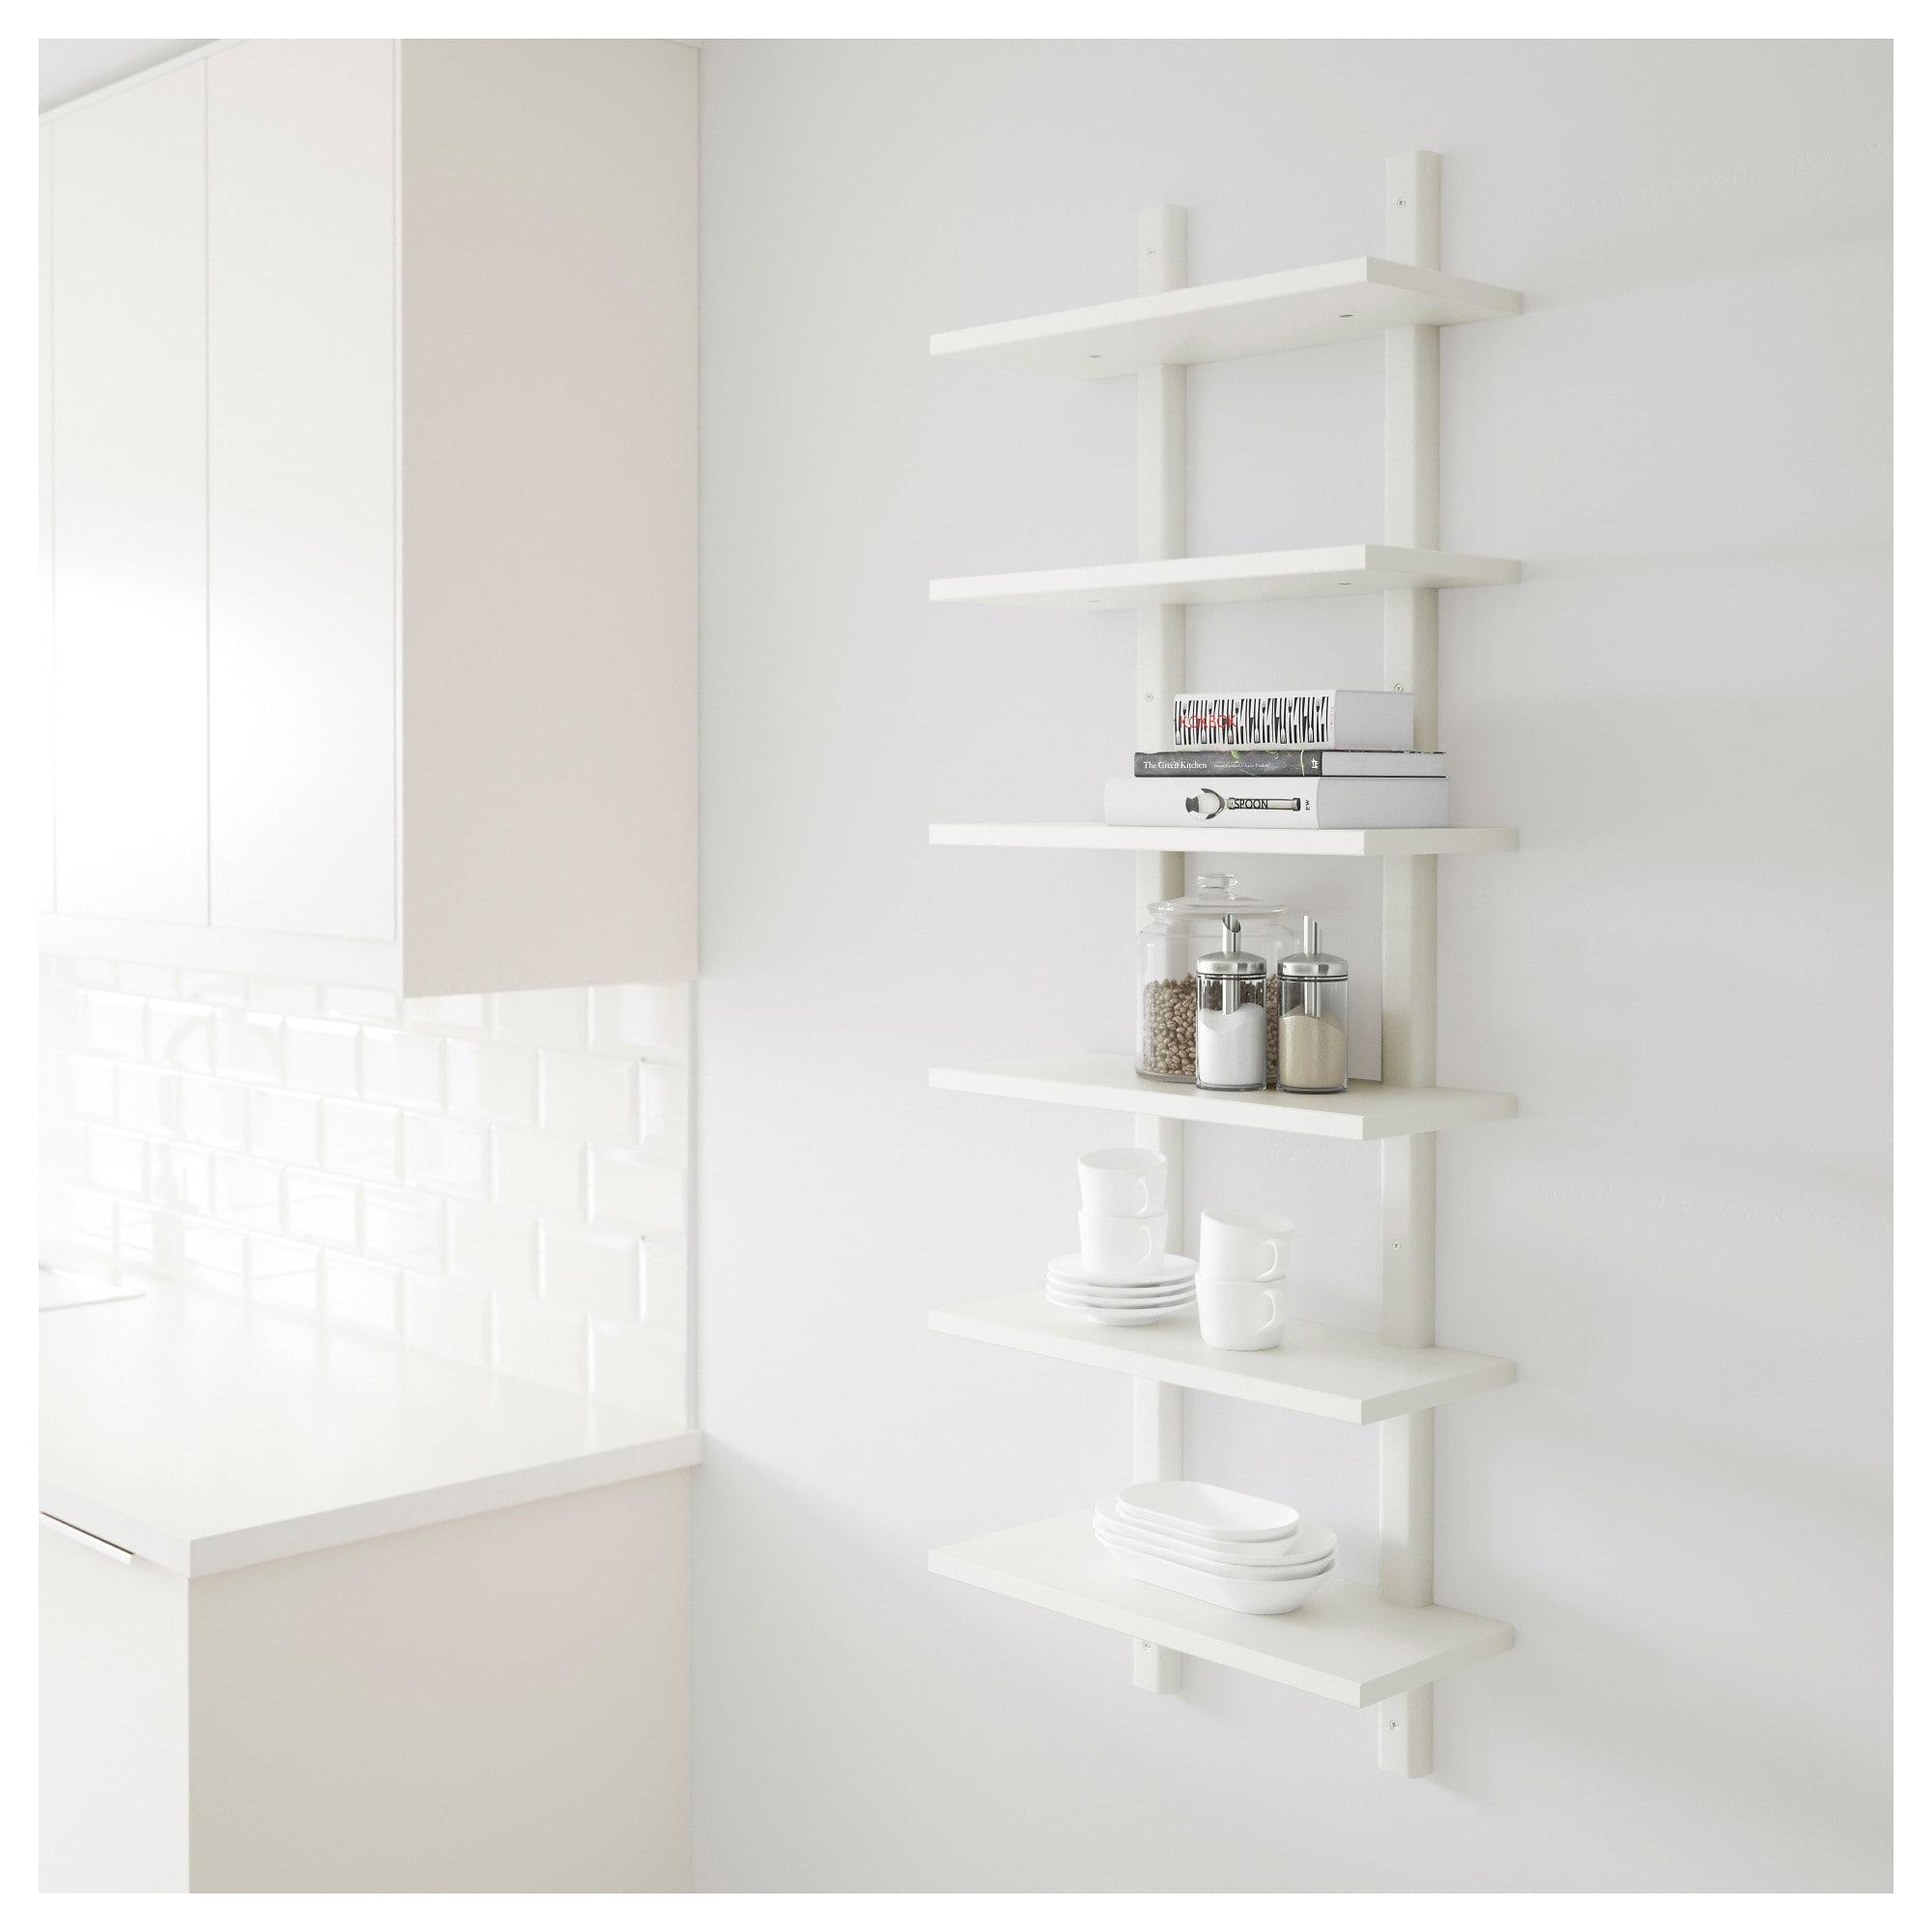 Sensational Varde Wall Shelf White Next House Ikea Wall Shelves Interior Design Ideas Gentotryabchikinfo